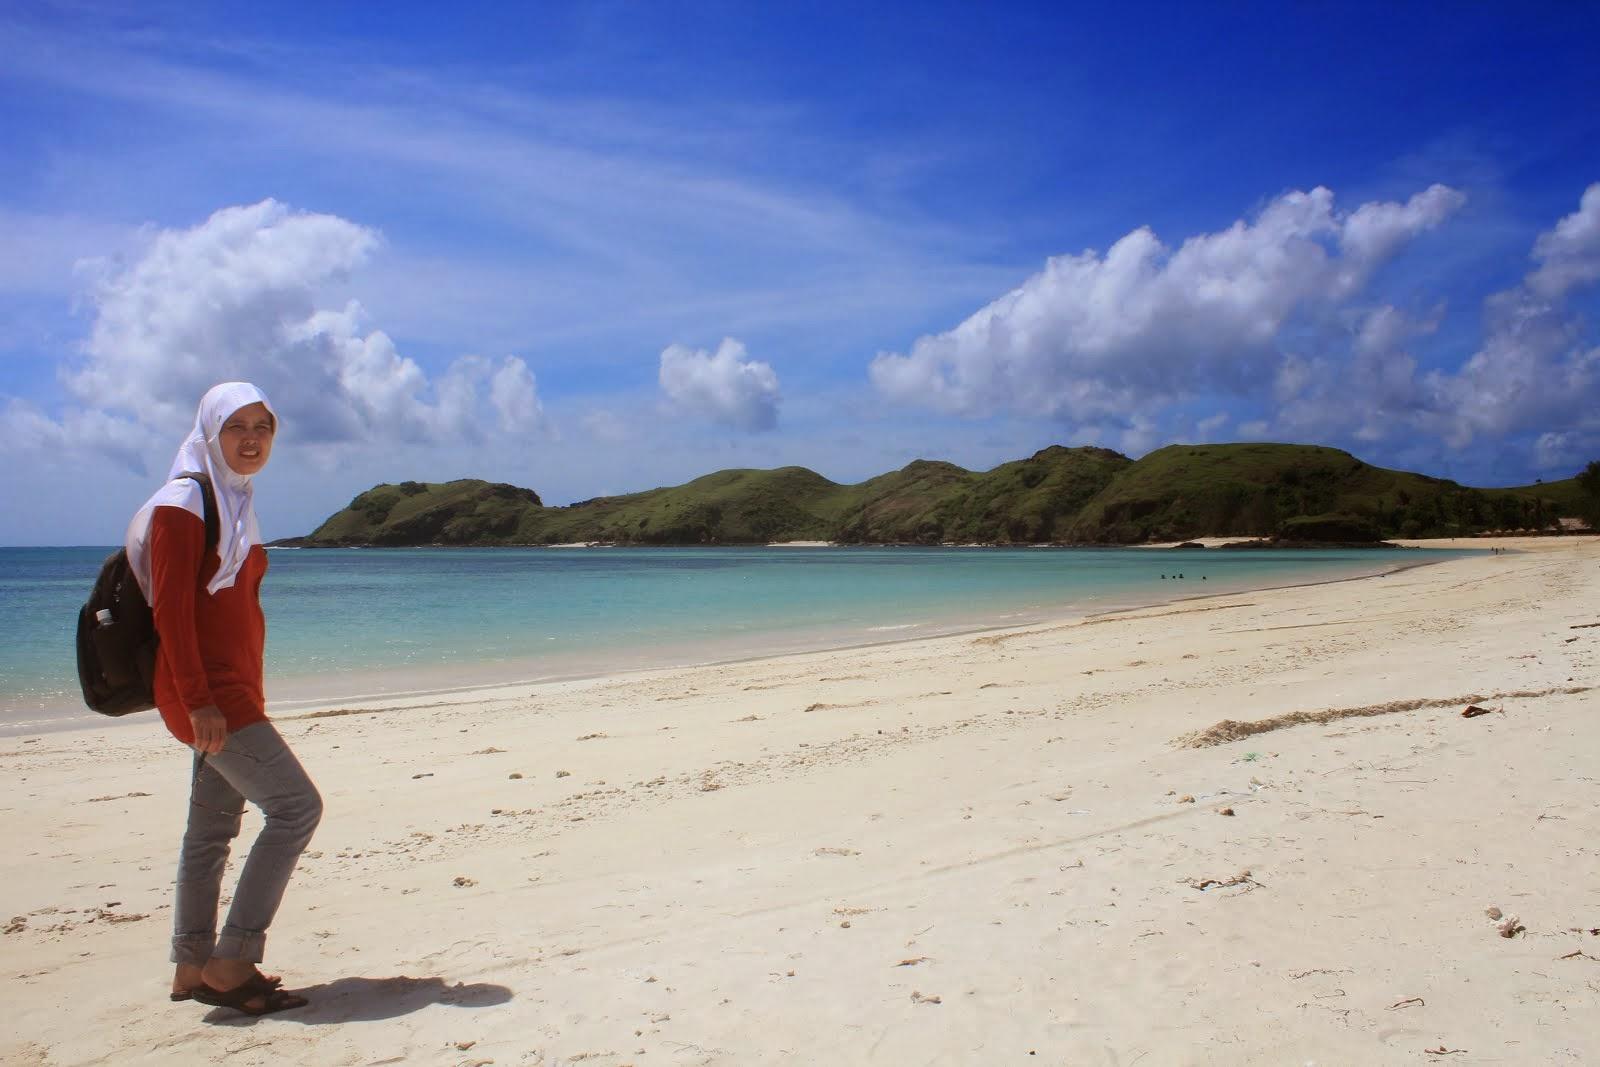 Tanjung aan, Lombok Tengah